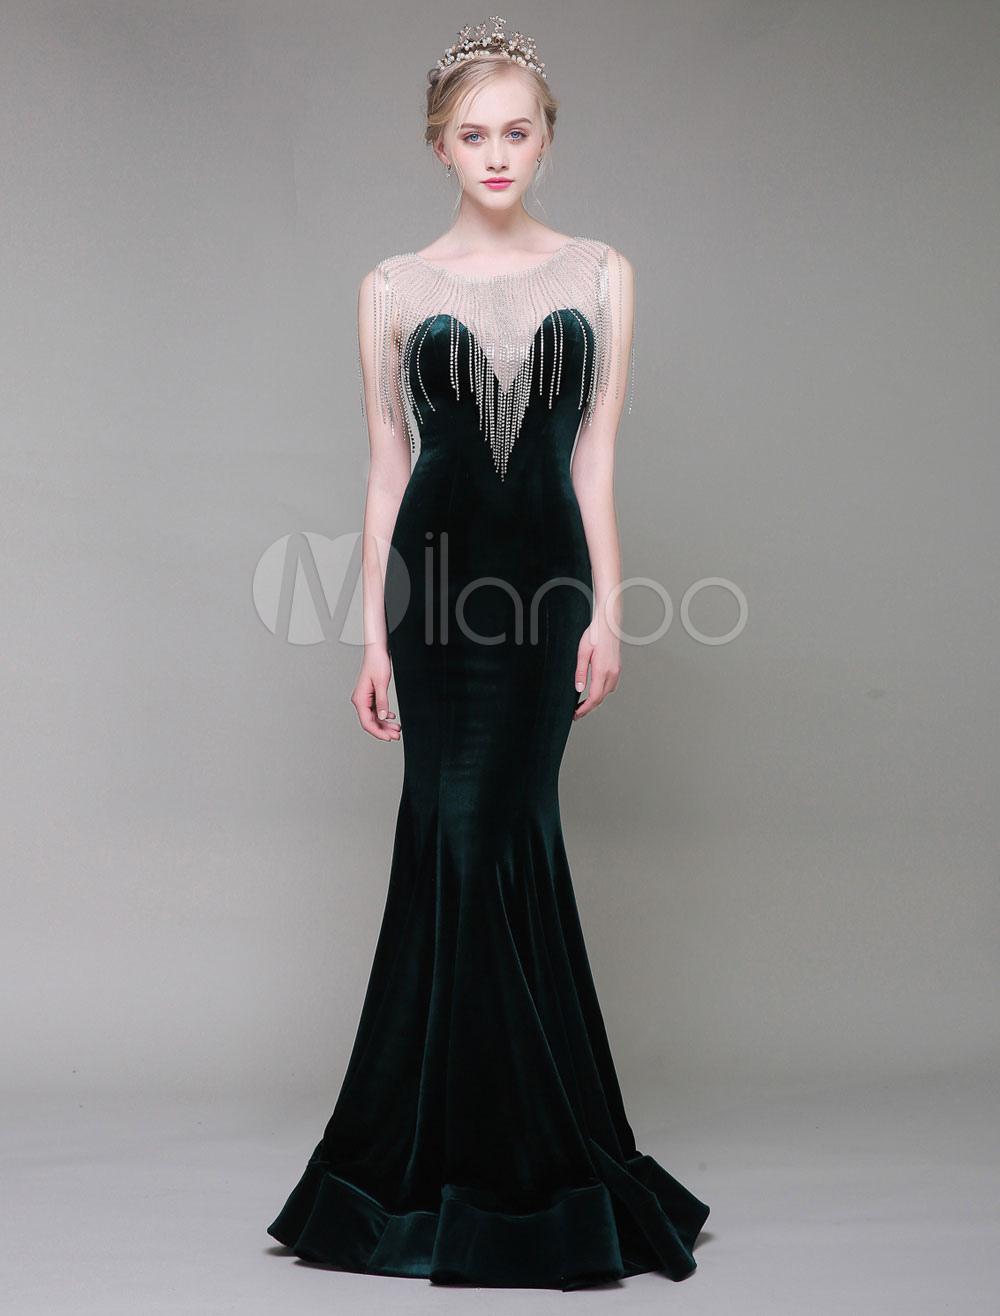 Velvet Evening Dresses Luxury Mermaid Dark Green Rhinestones Tassels ...